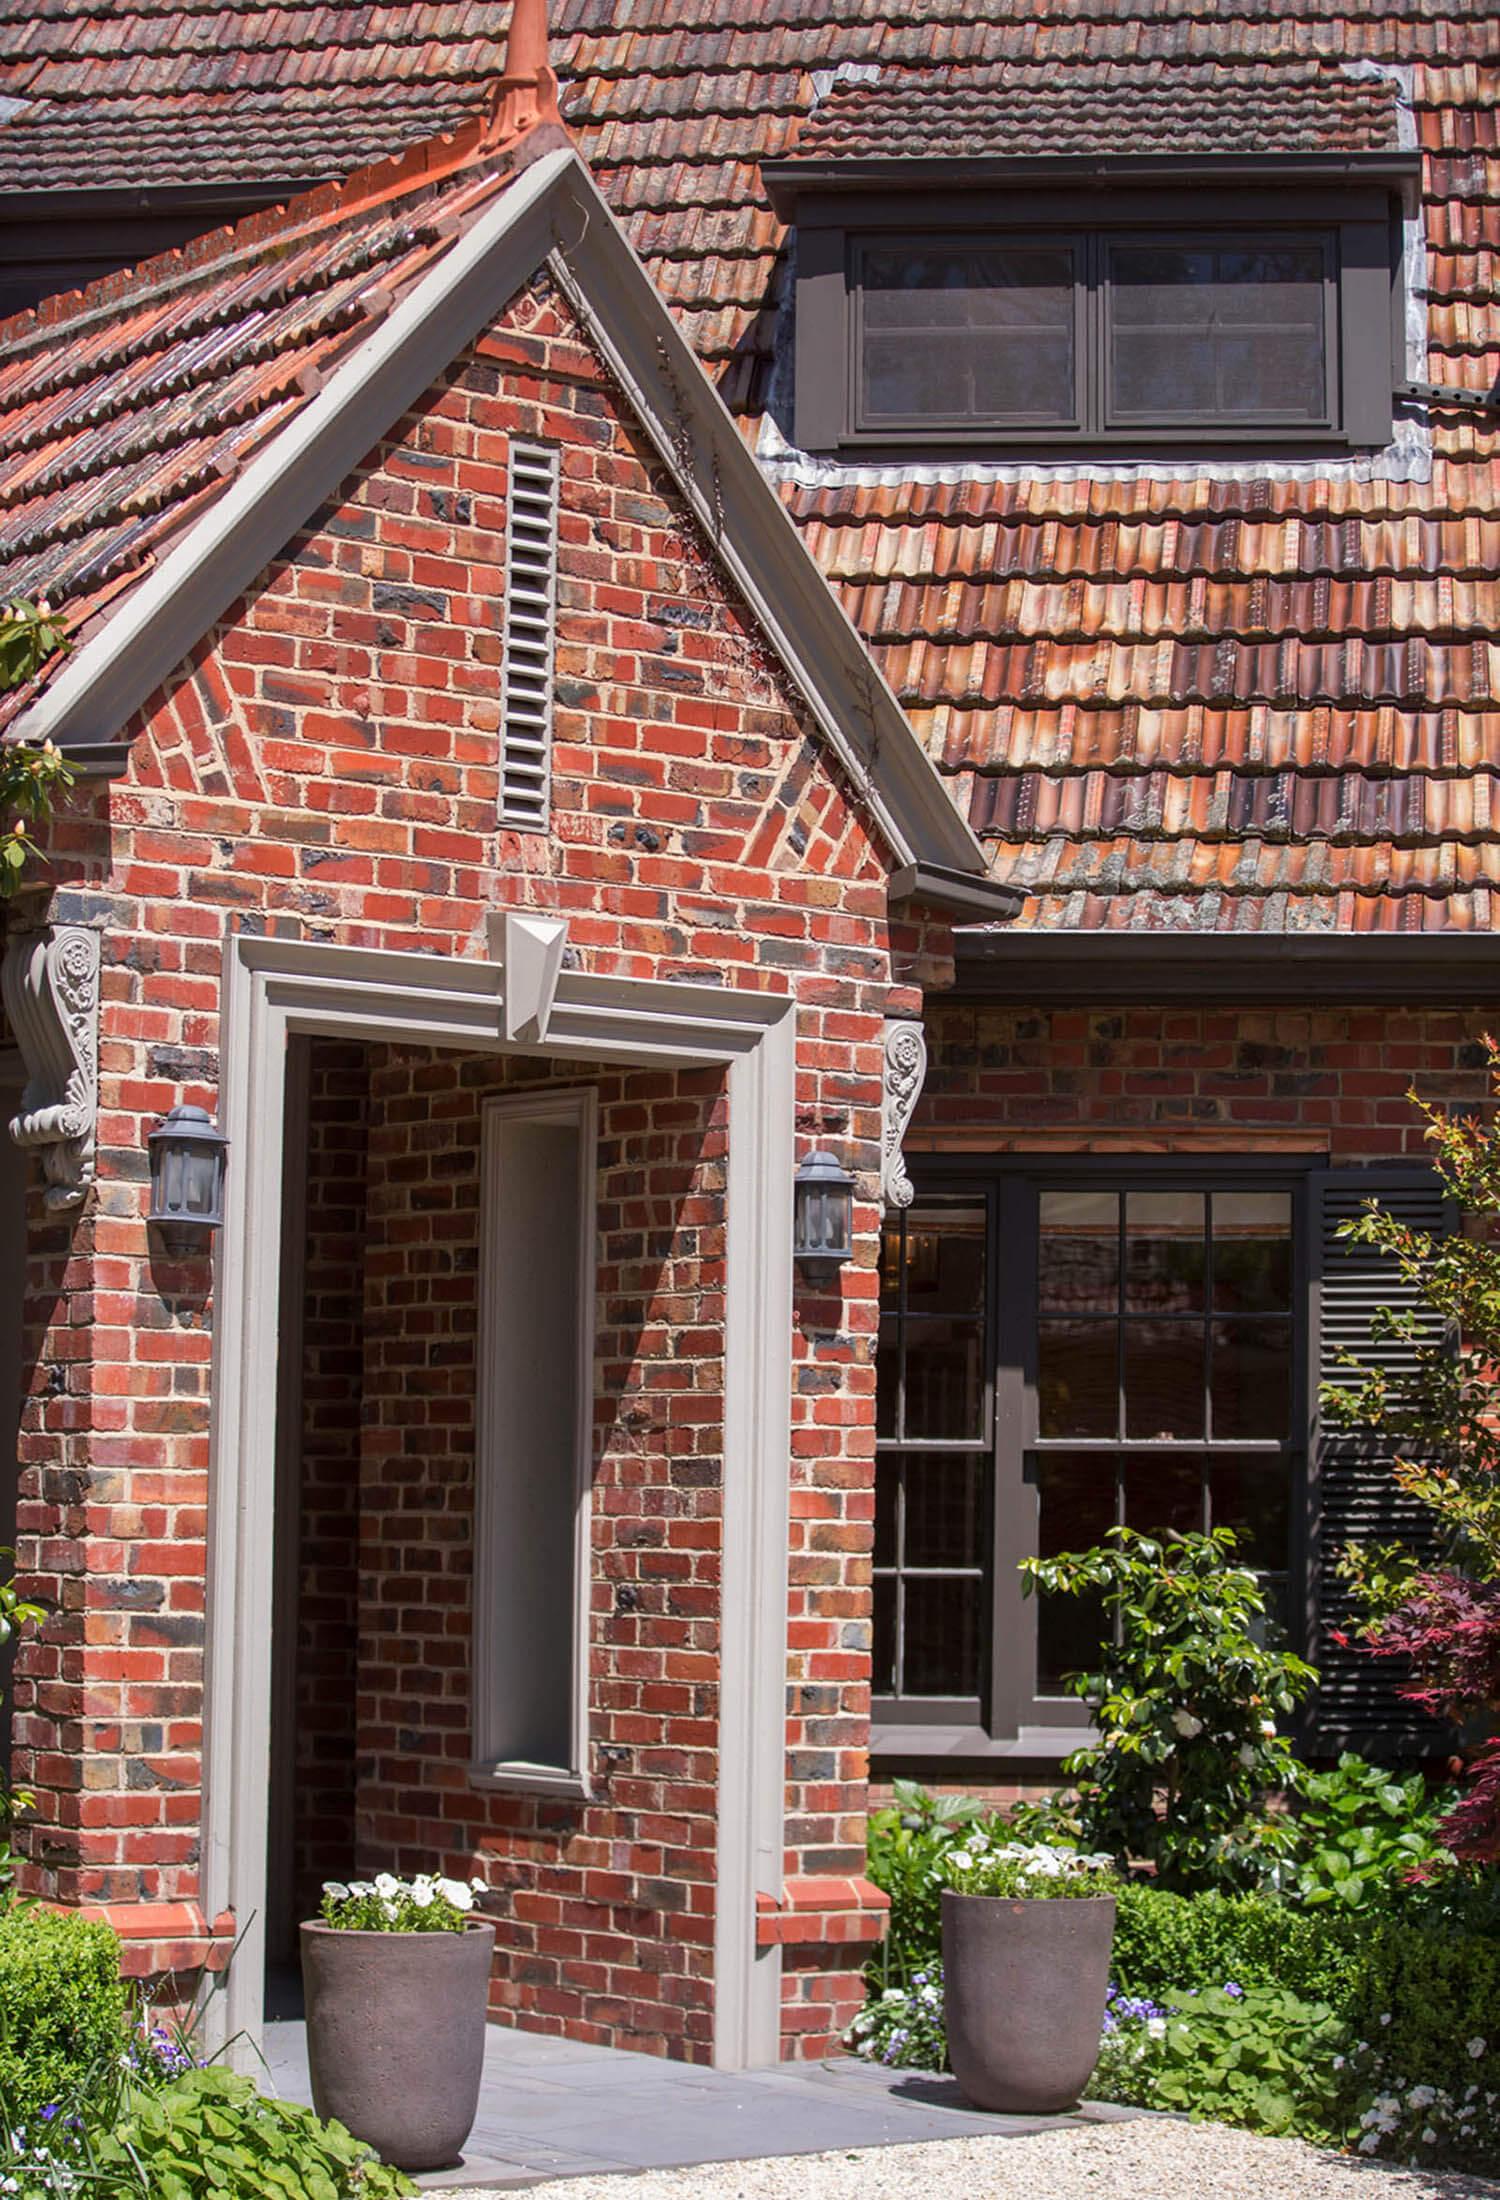 est living open house jellis craig 349 Union Road Balwyn 19